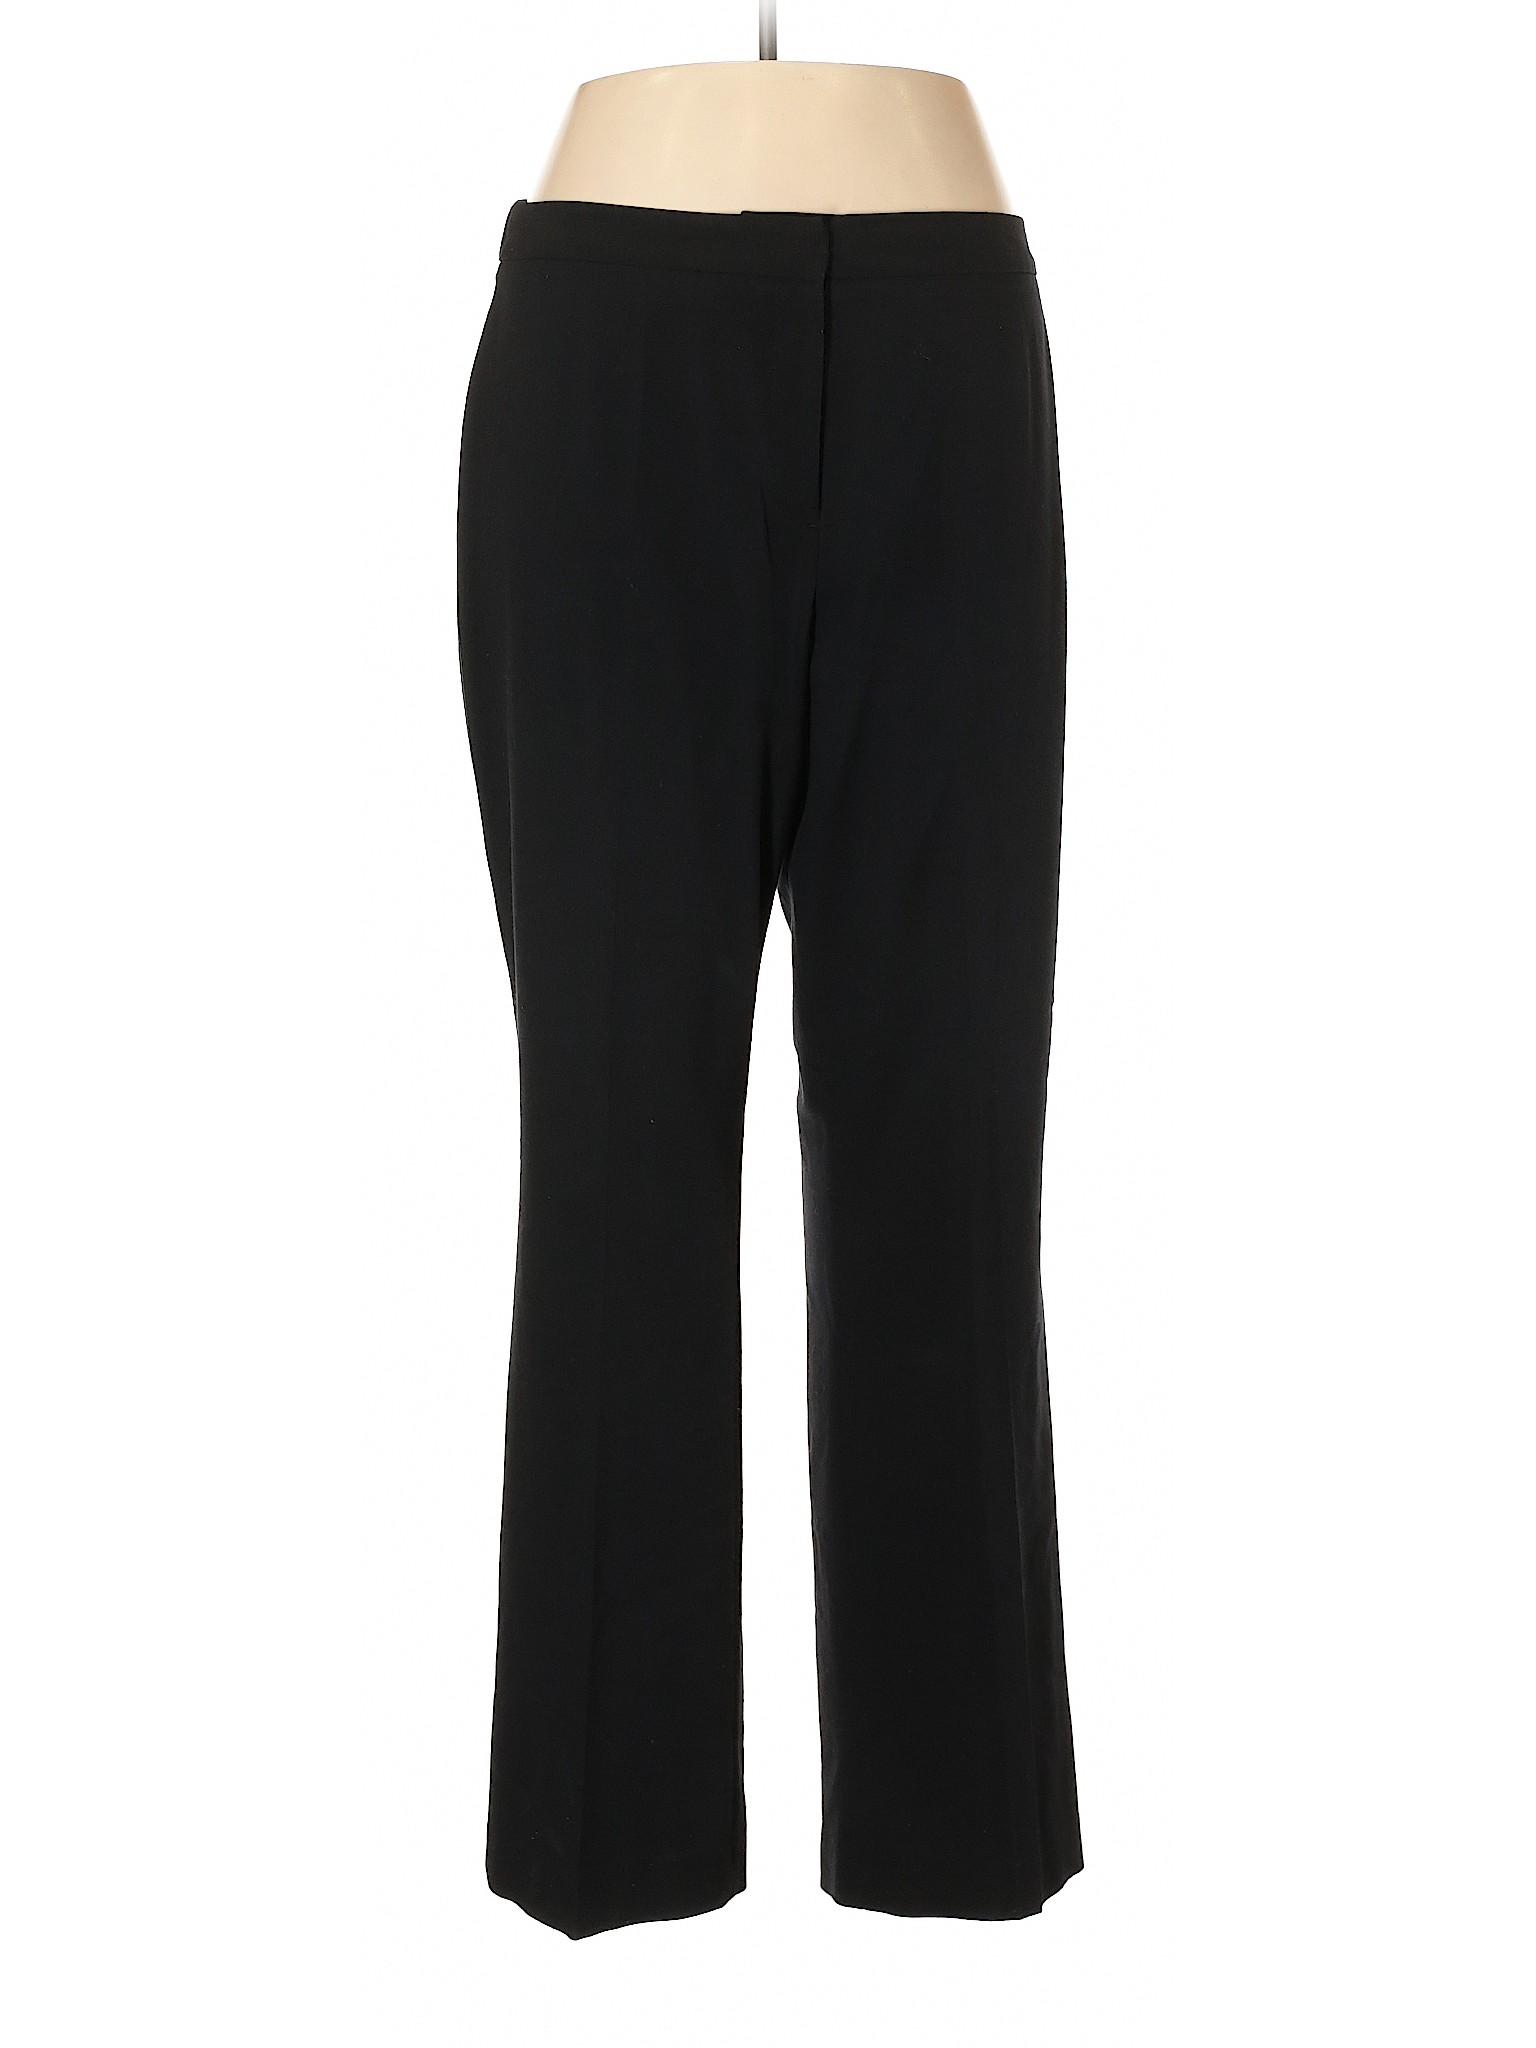 leisure Buchman Dana Boutique Pants Dress vaYUUw